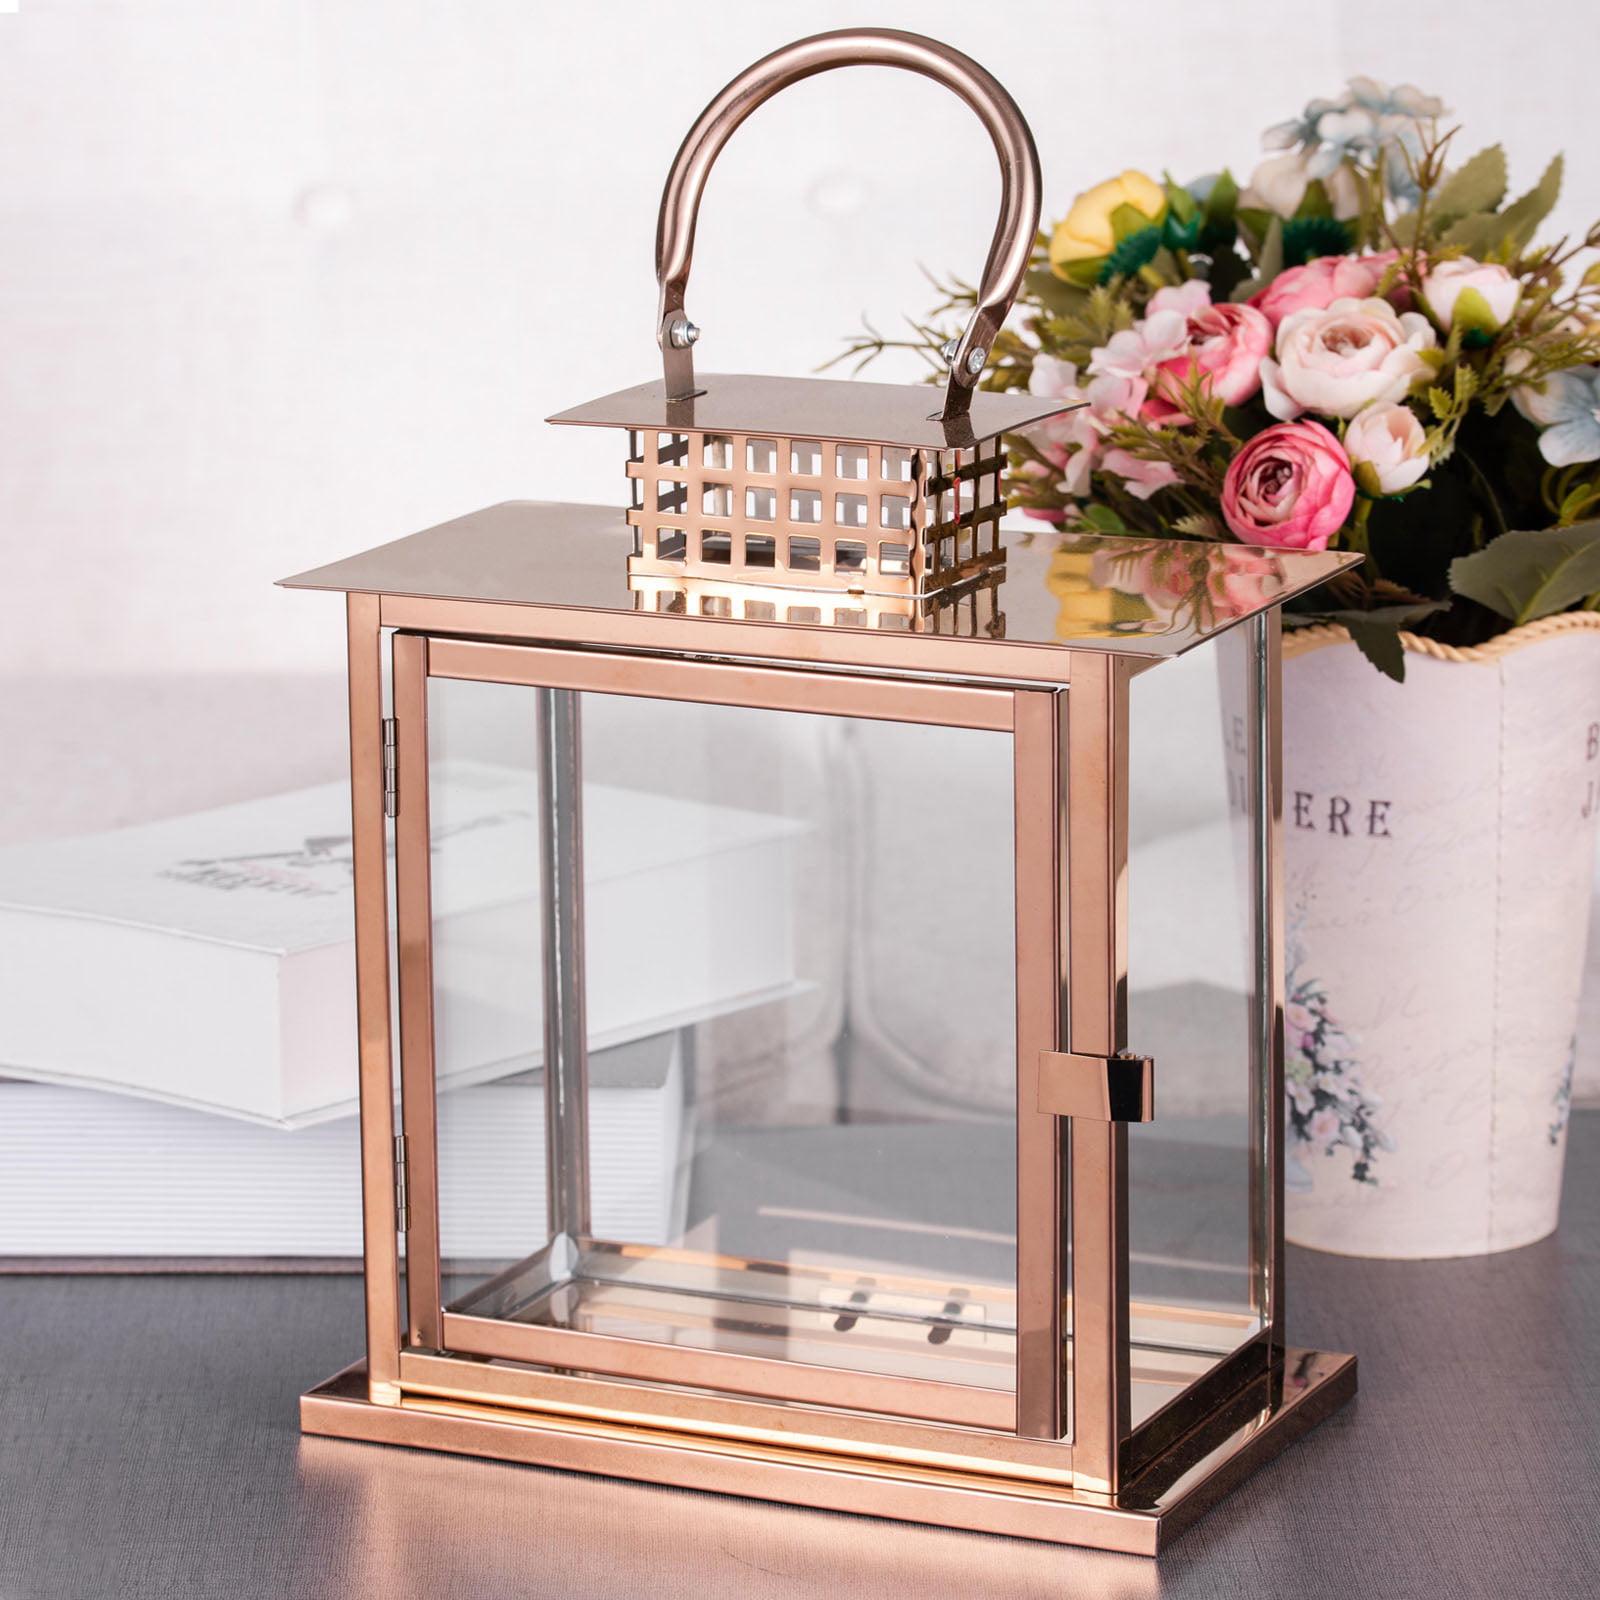 Tall metal lantern candle holder